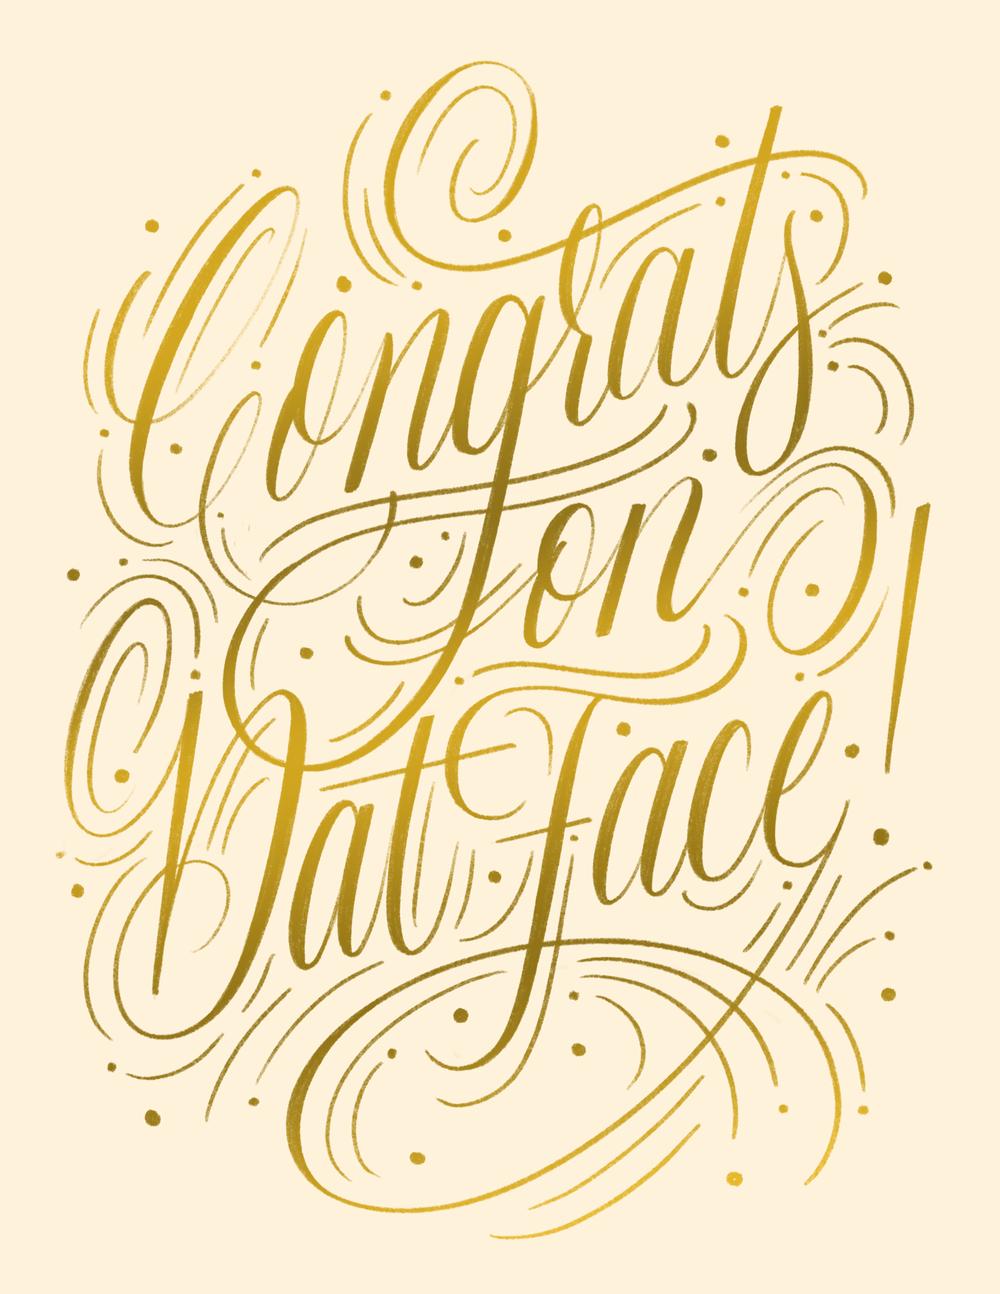 CongratsonDatFace.png